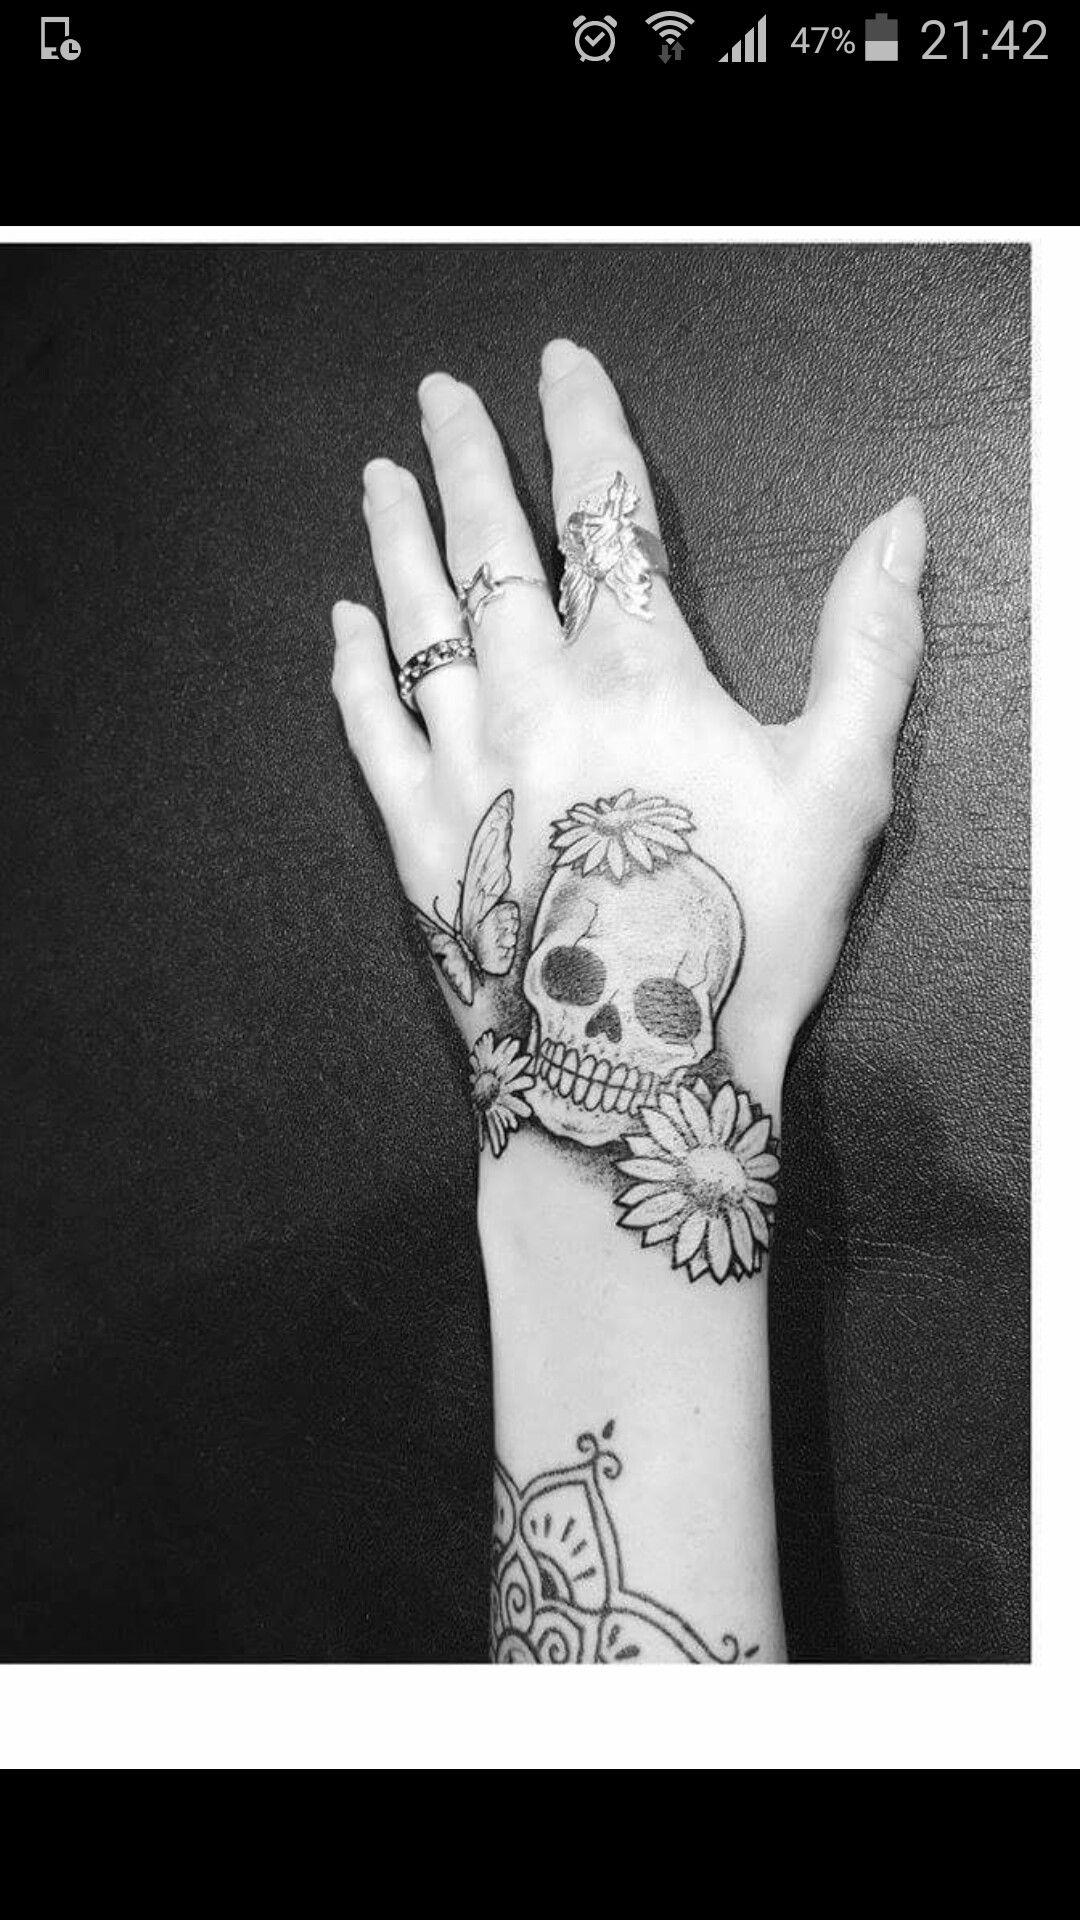 Pin by tia berger on utattoou pinterest tattoo